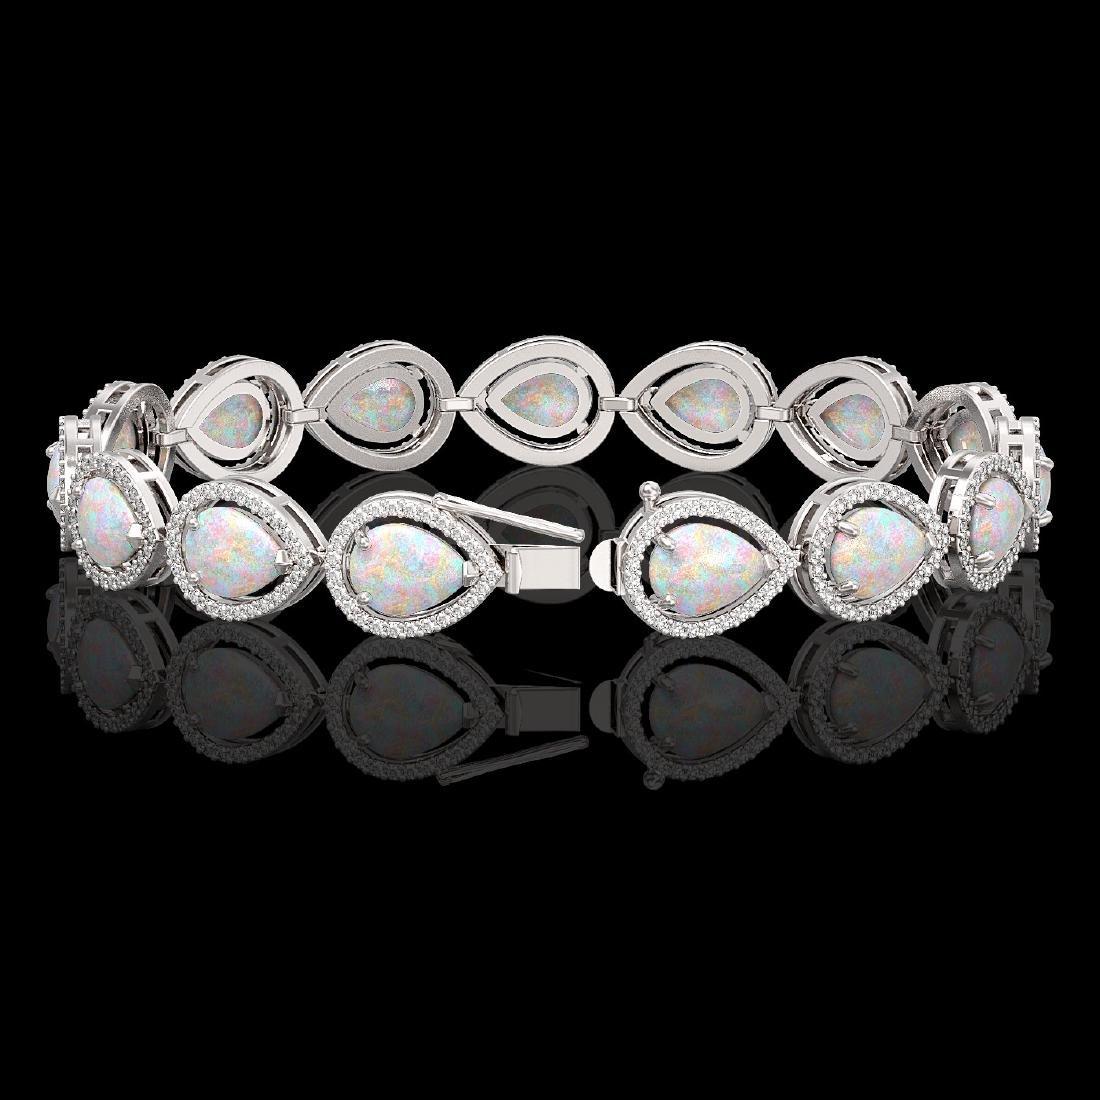 17.15 CTW Opal & Diamond Halo Bracelet 10K White Gold - 2